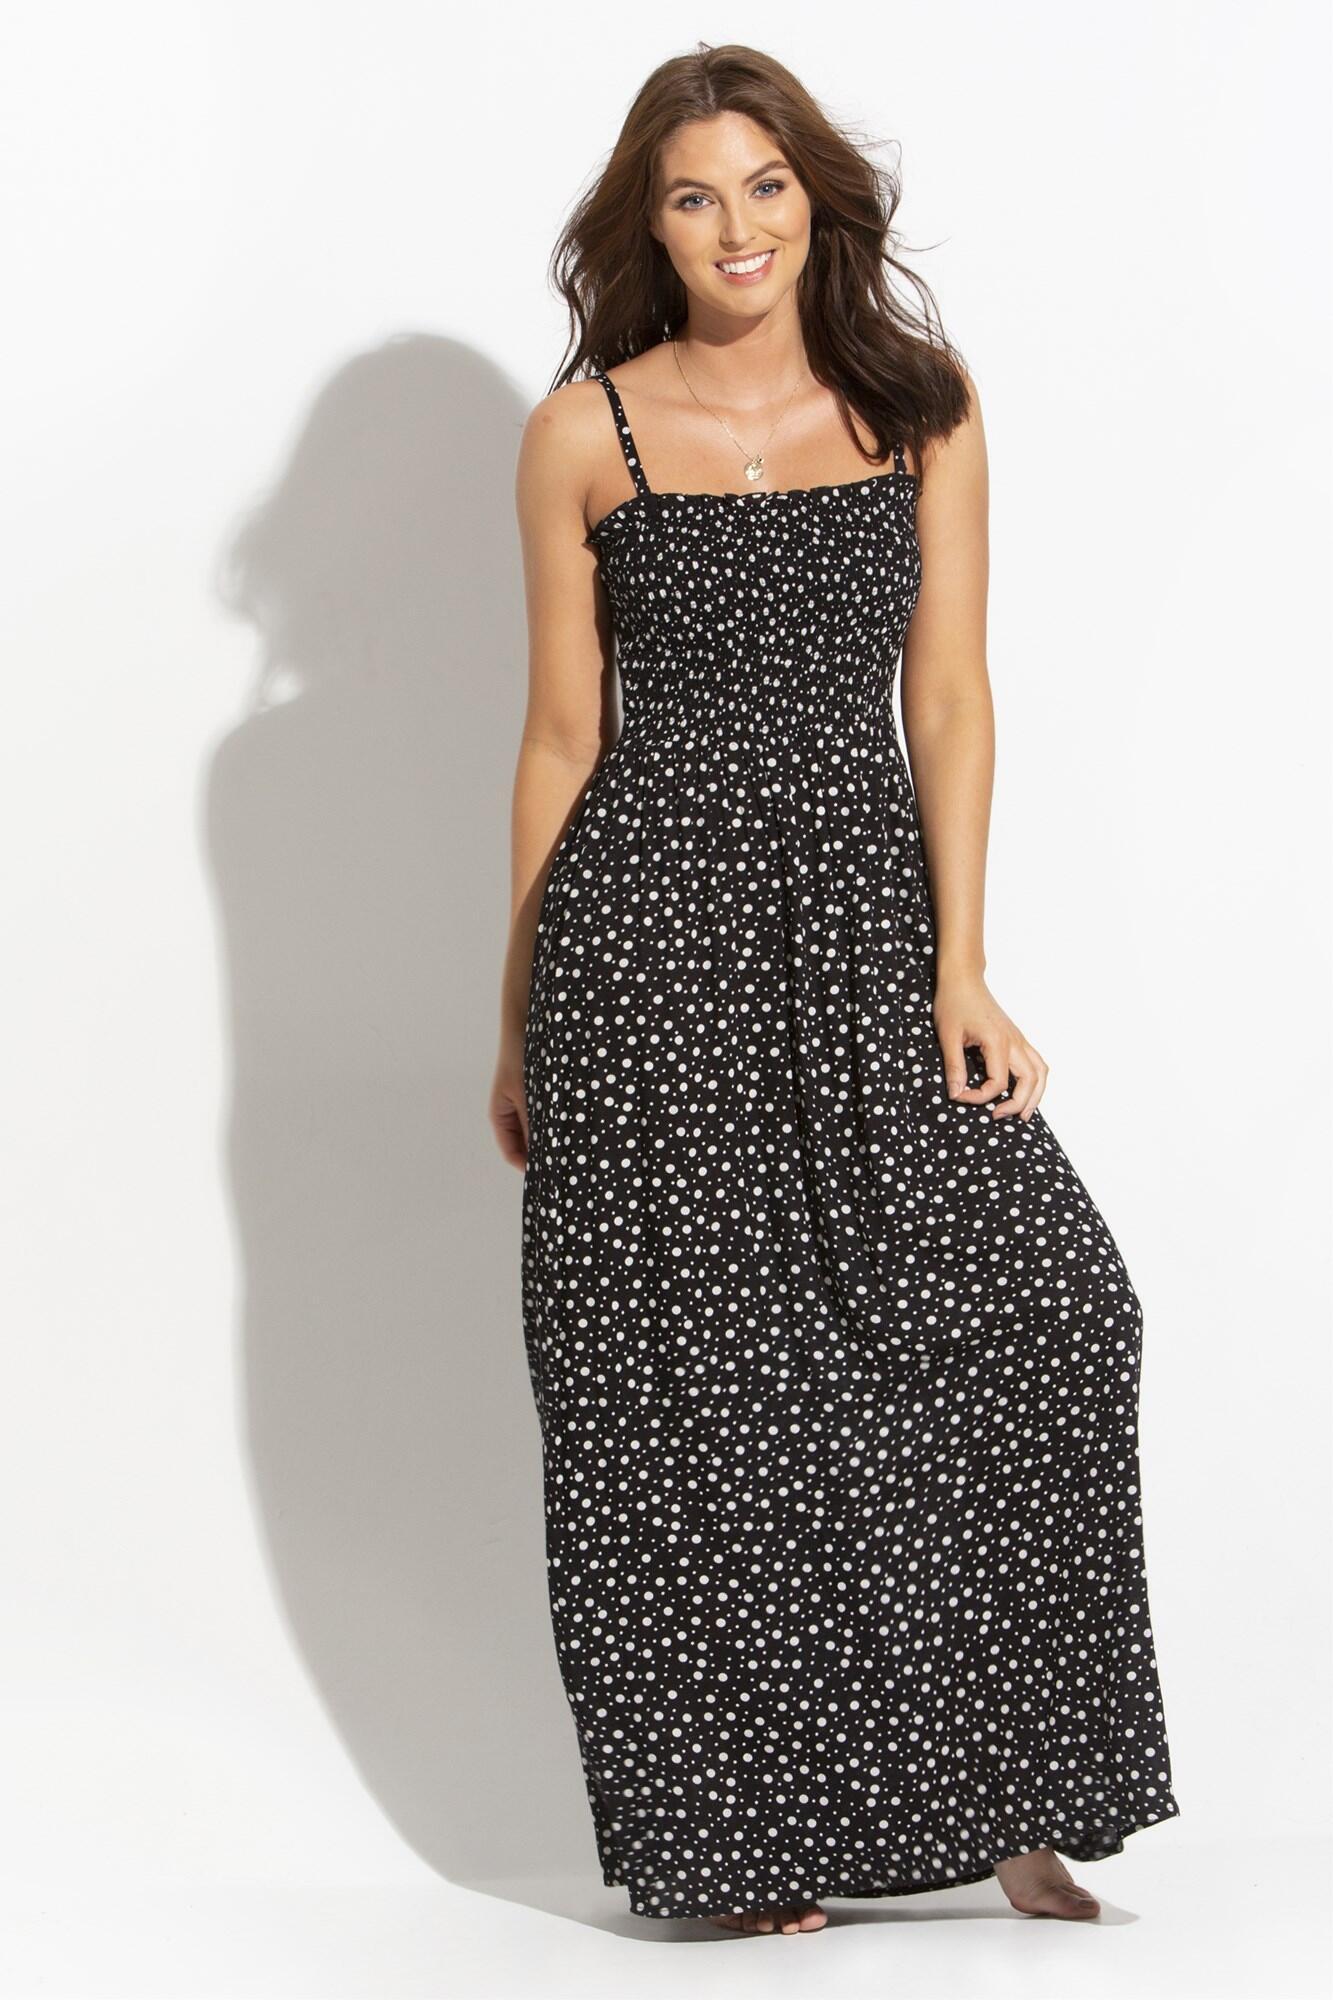 Removable Straps Shirred Bodice Maxi Dress - Black/White